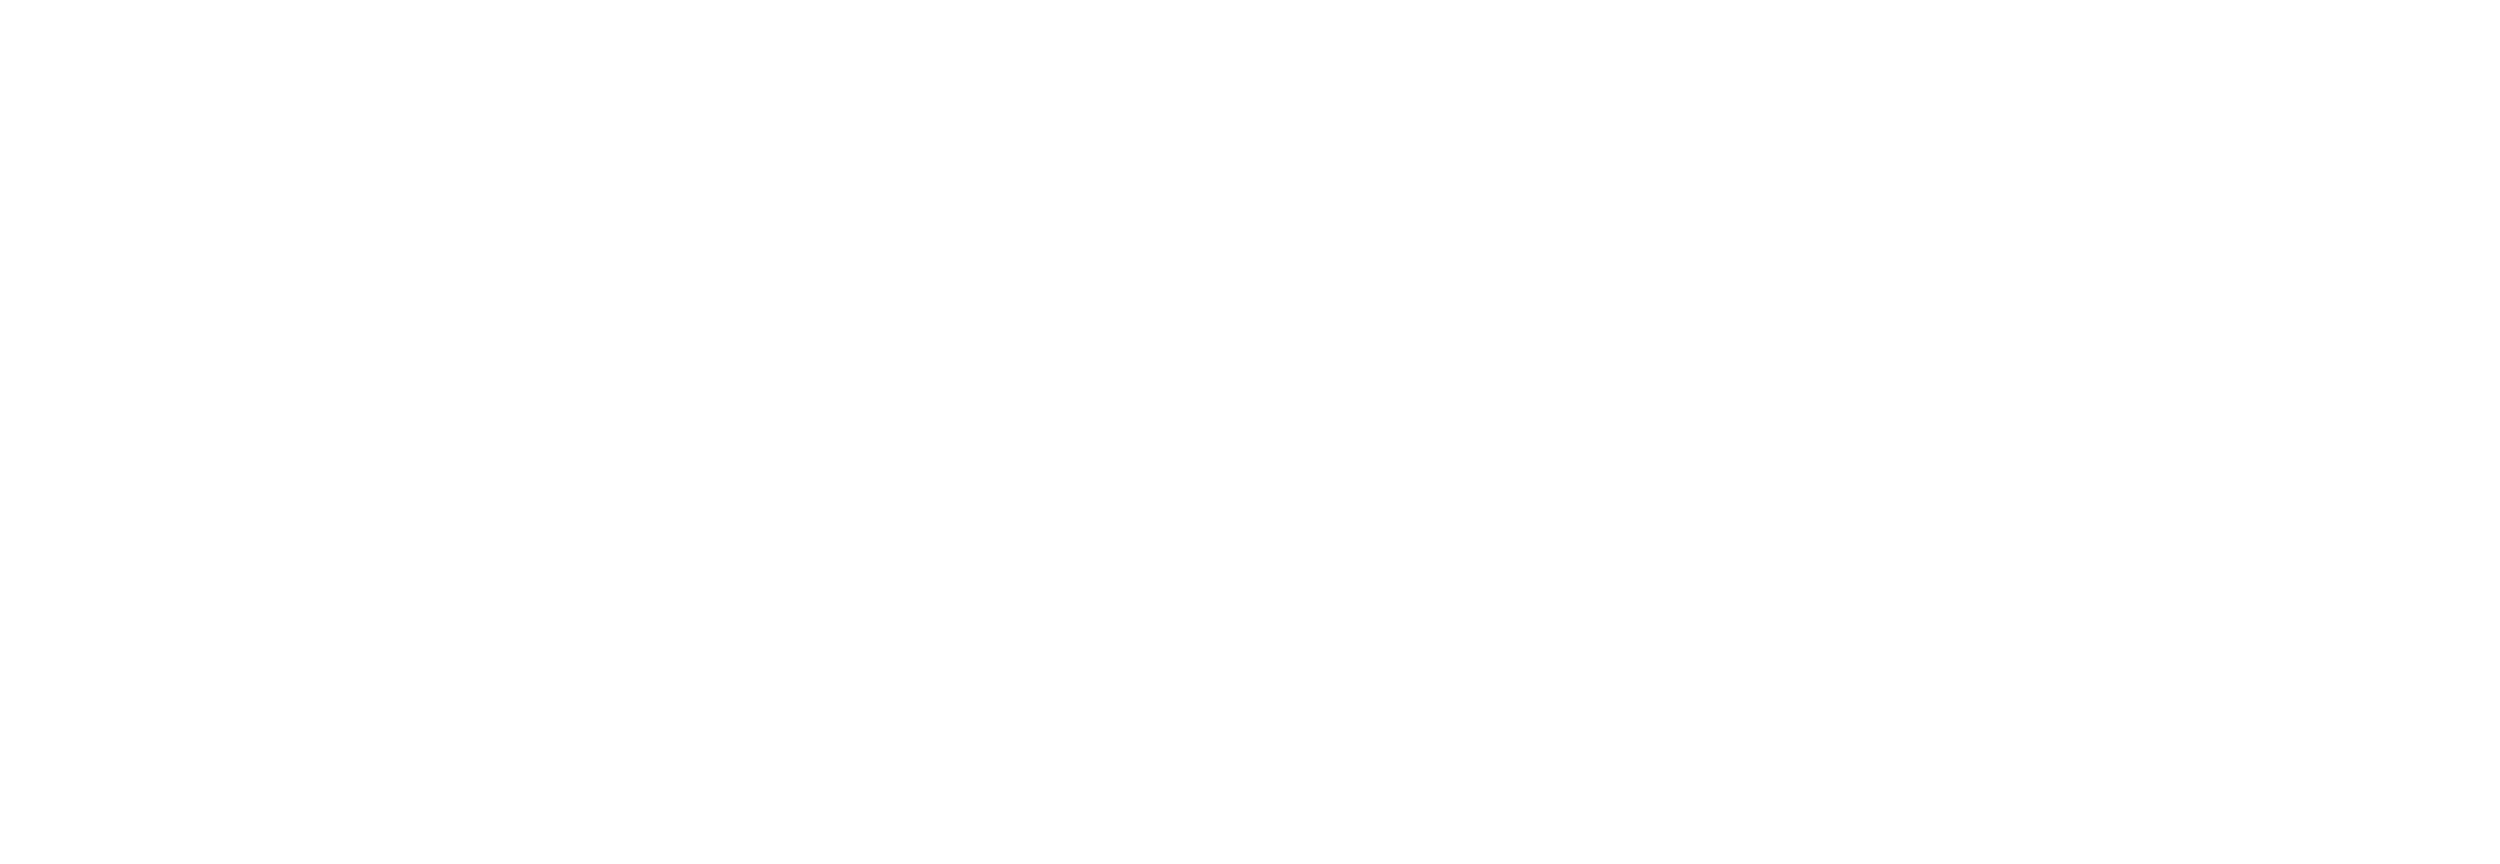 Graph Increasing White Icon